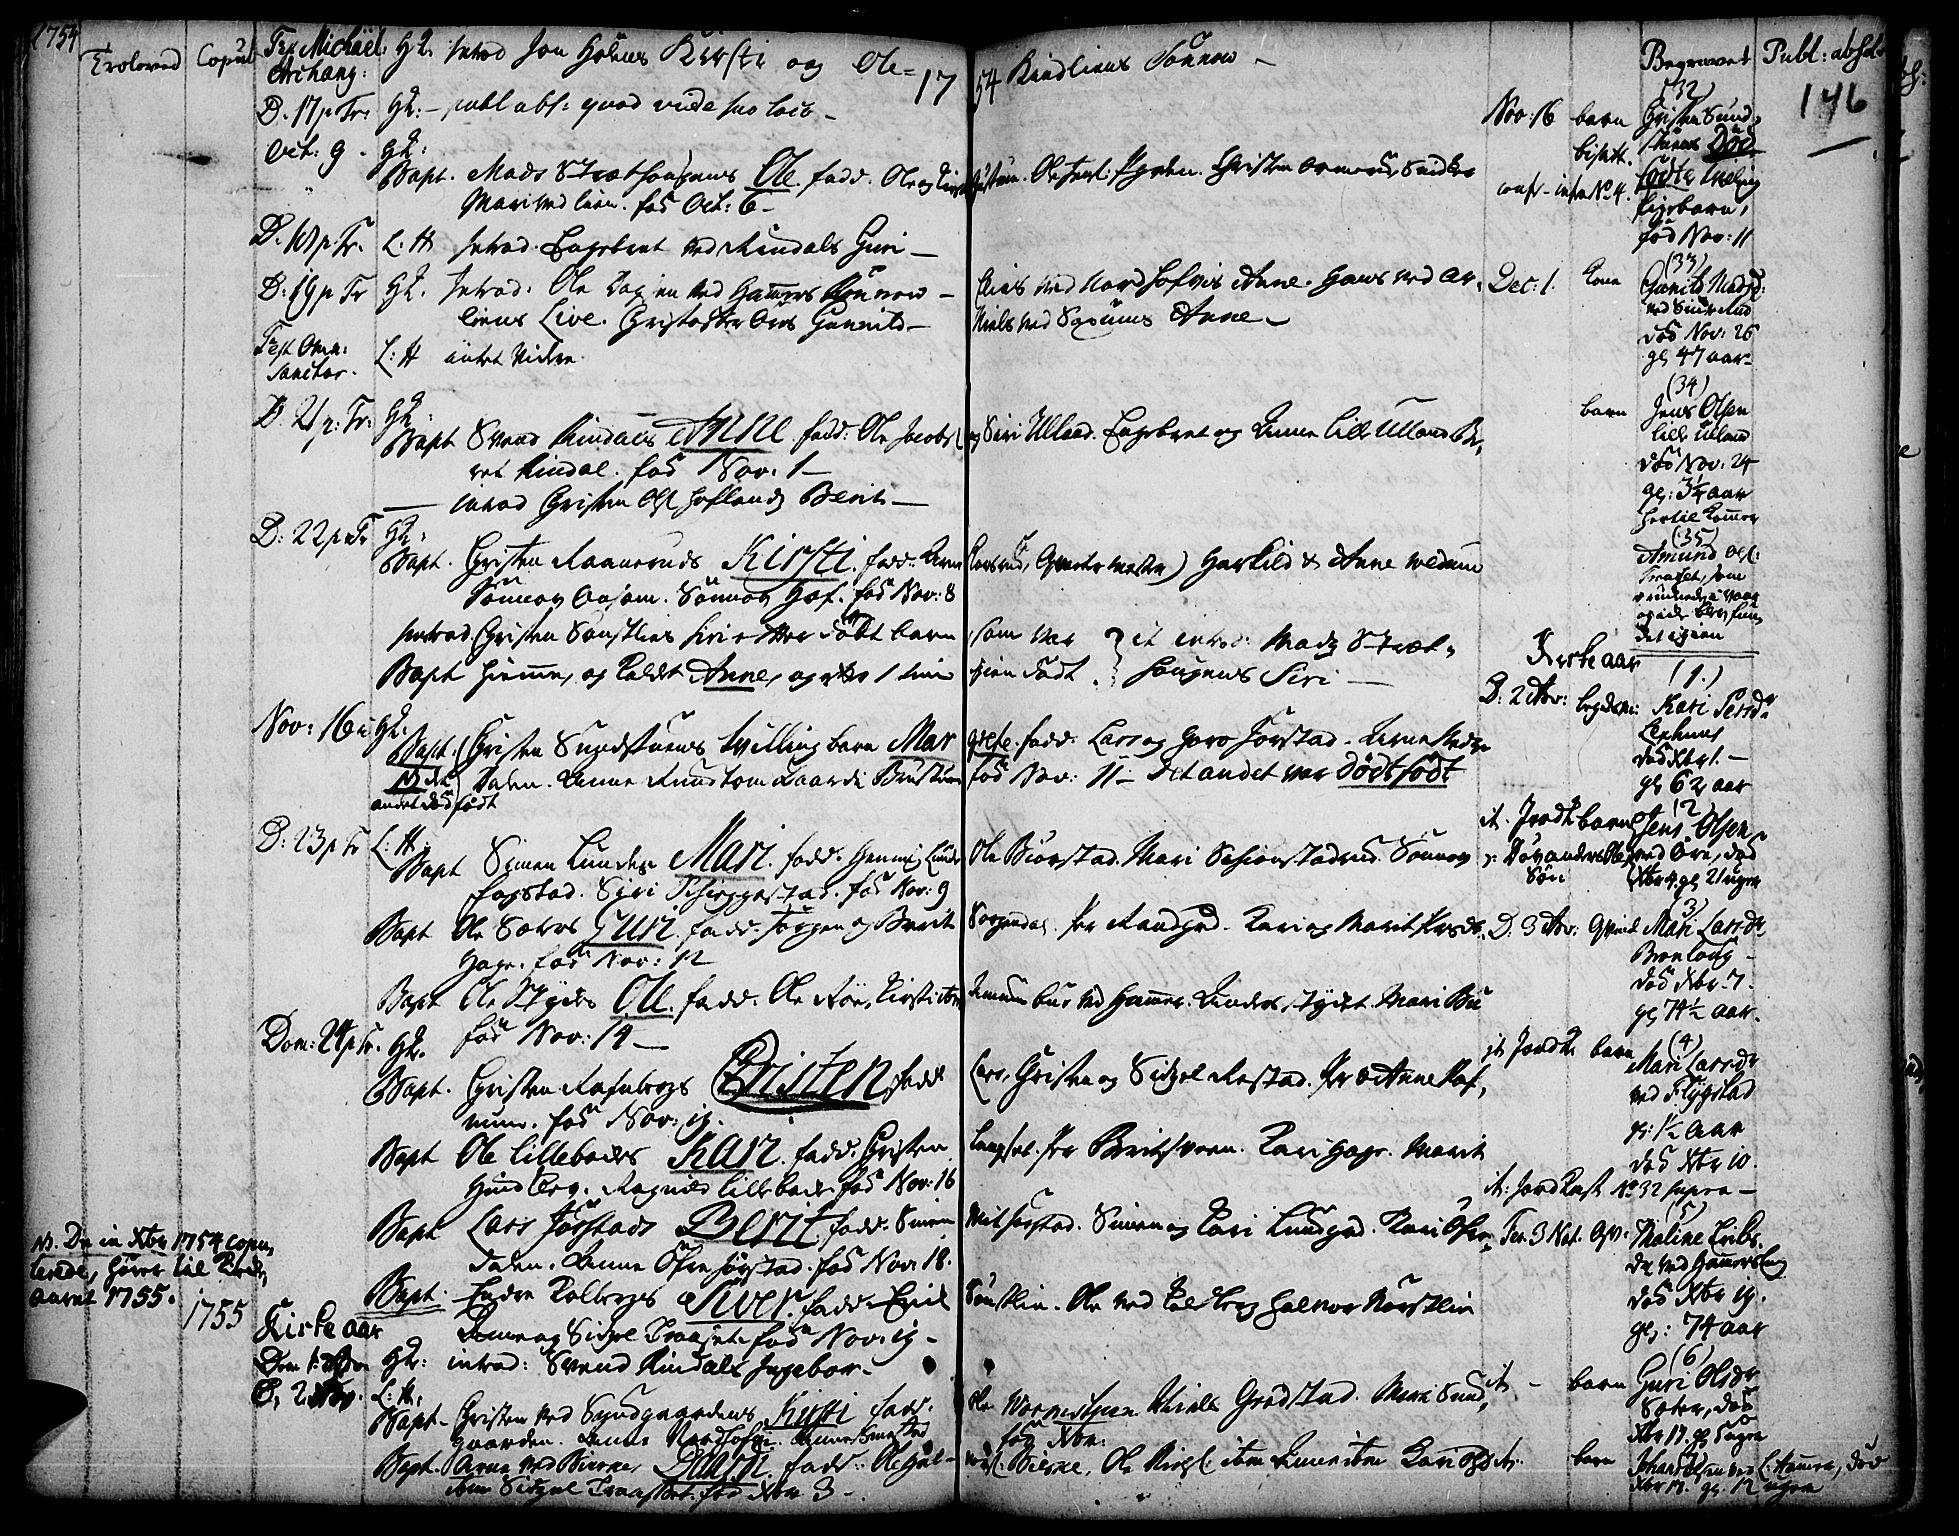 SAH, Fåberg prestekontor, Ministerialbok nr. 1, 1727-1775, s. 146